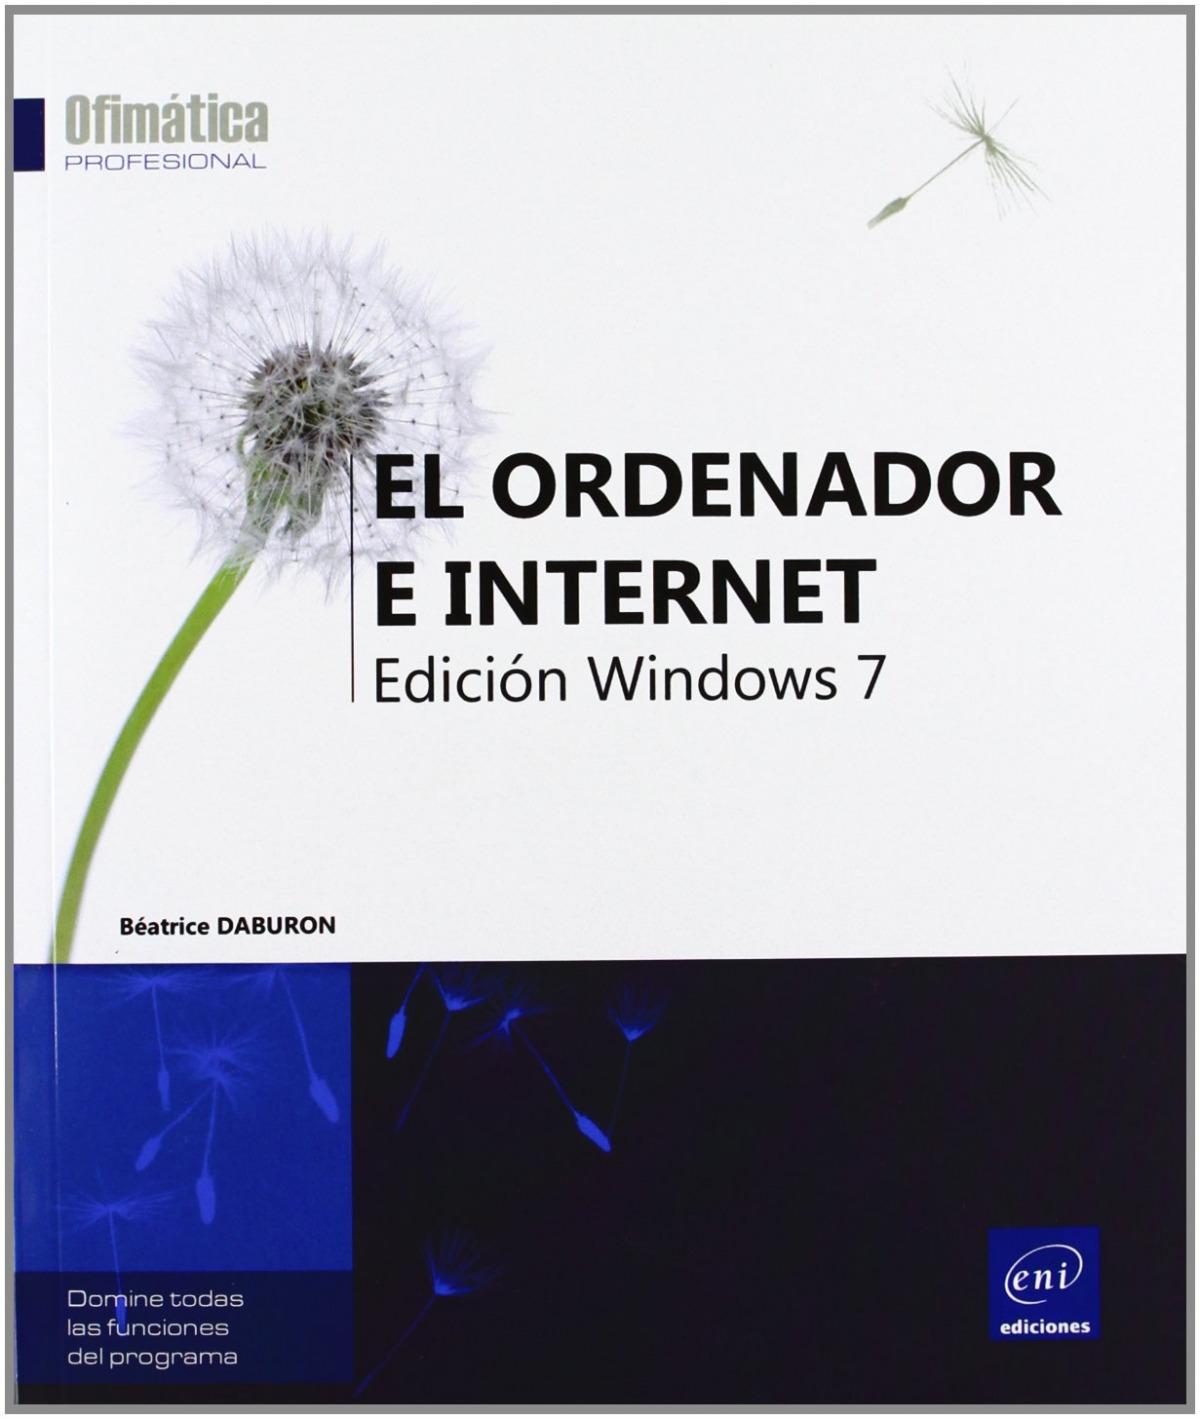 Ofimática Prof. El ordenador e Internet - ed. Windows 7